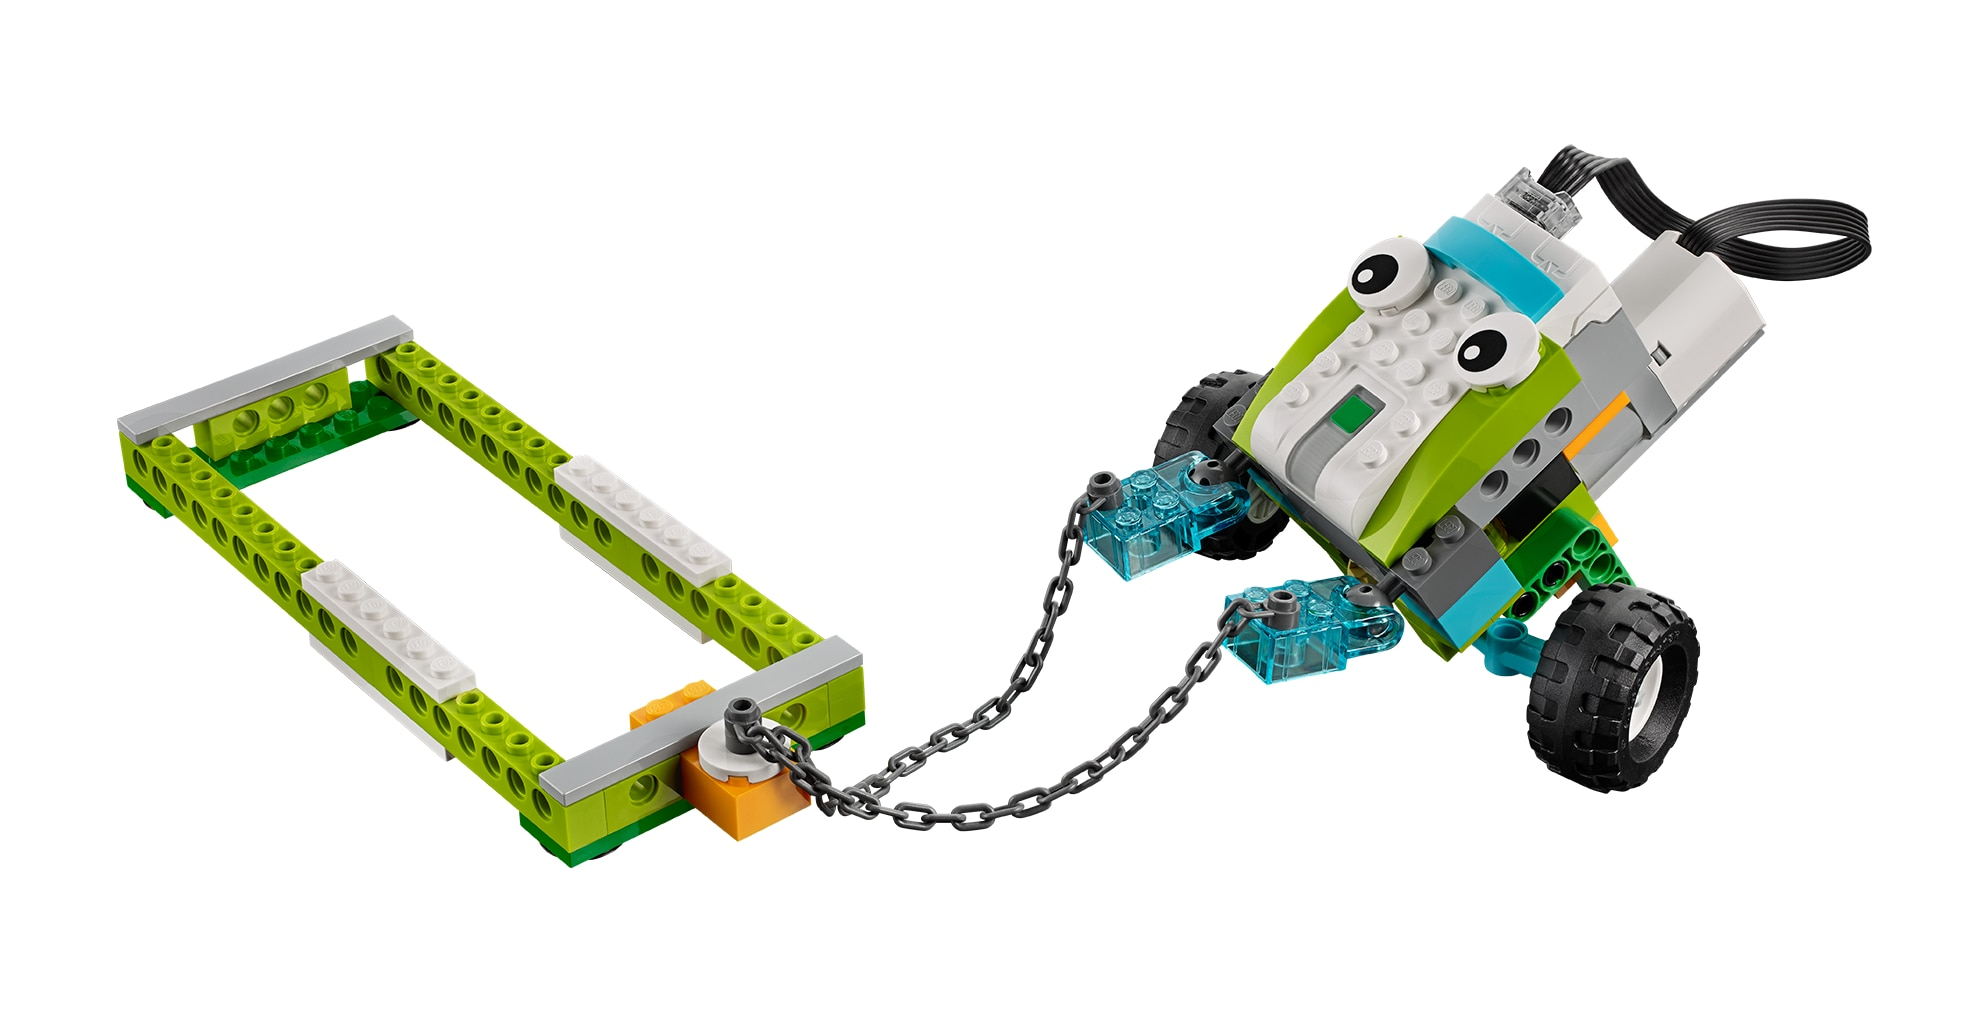 Pulling - WeDo 2.0 Science - Lesson Plans - LEGO Education